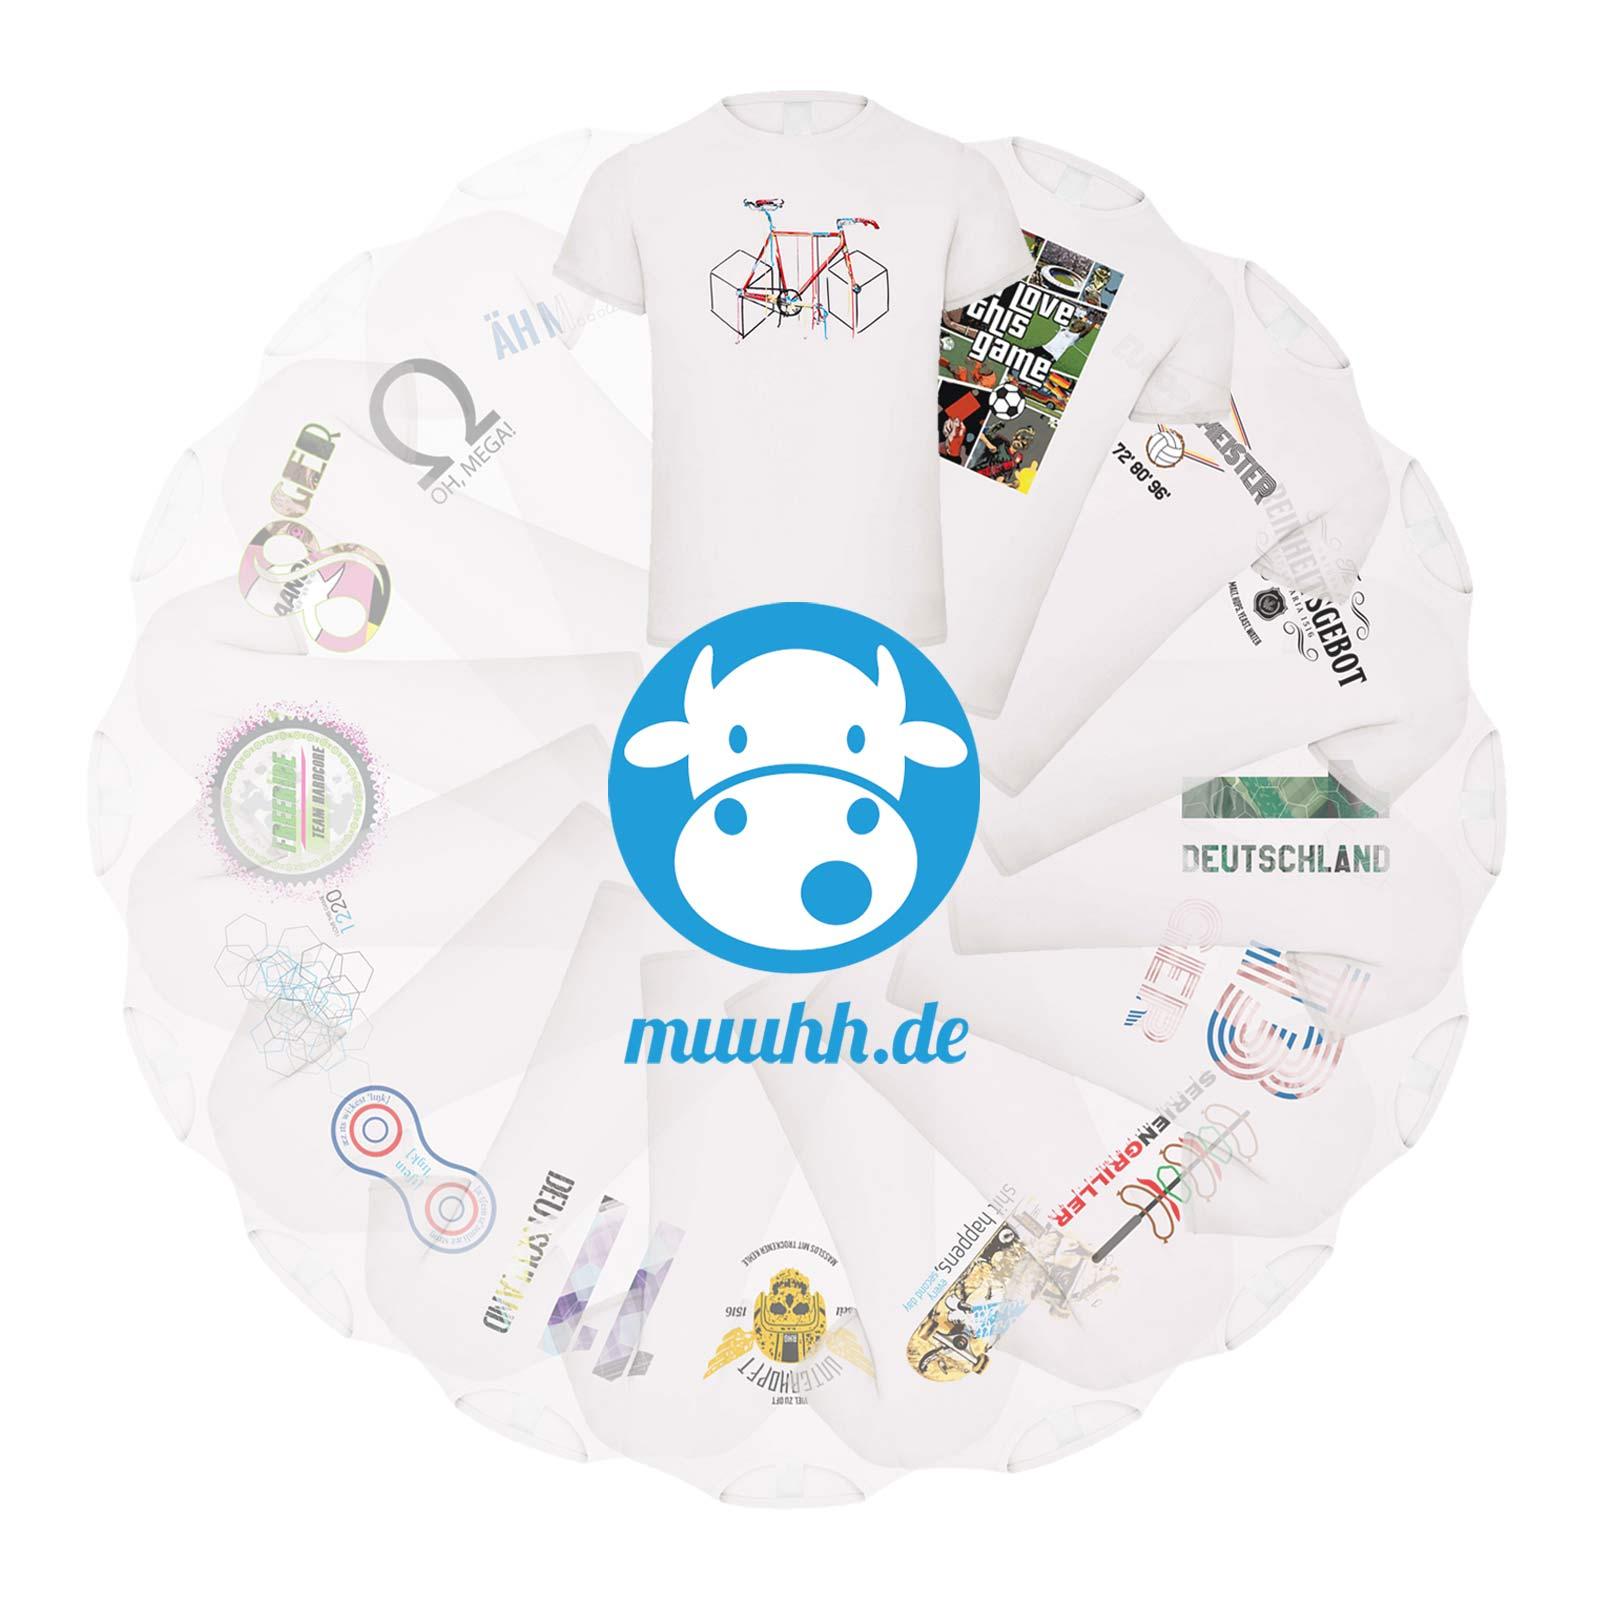 www.muuhh.de Funshirts Pyrotechnik